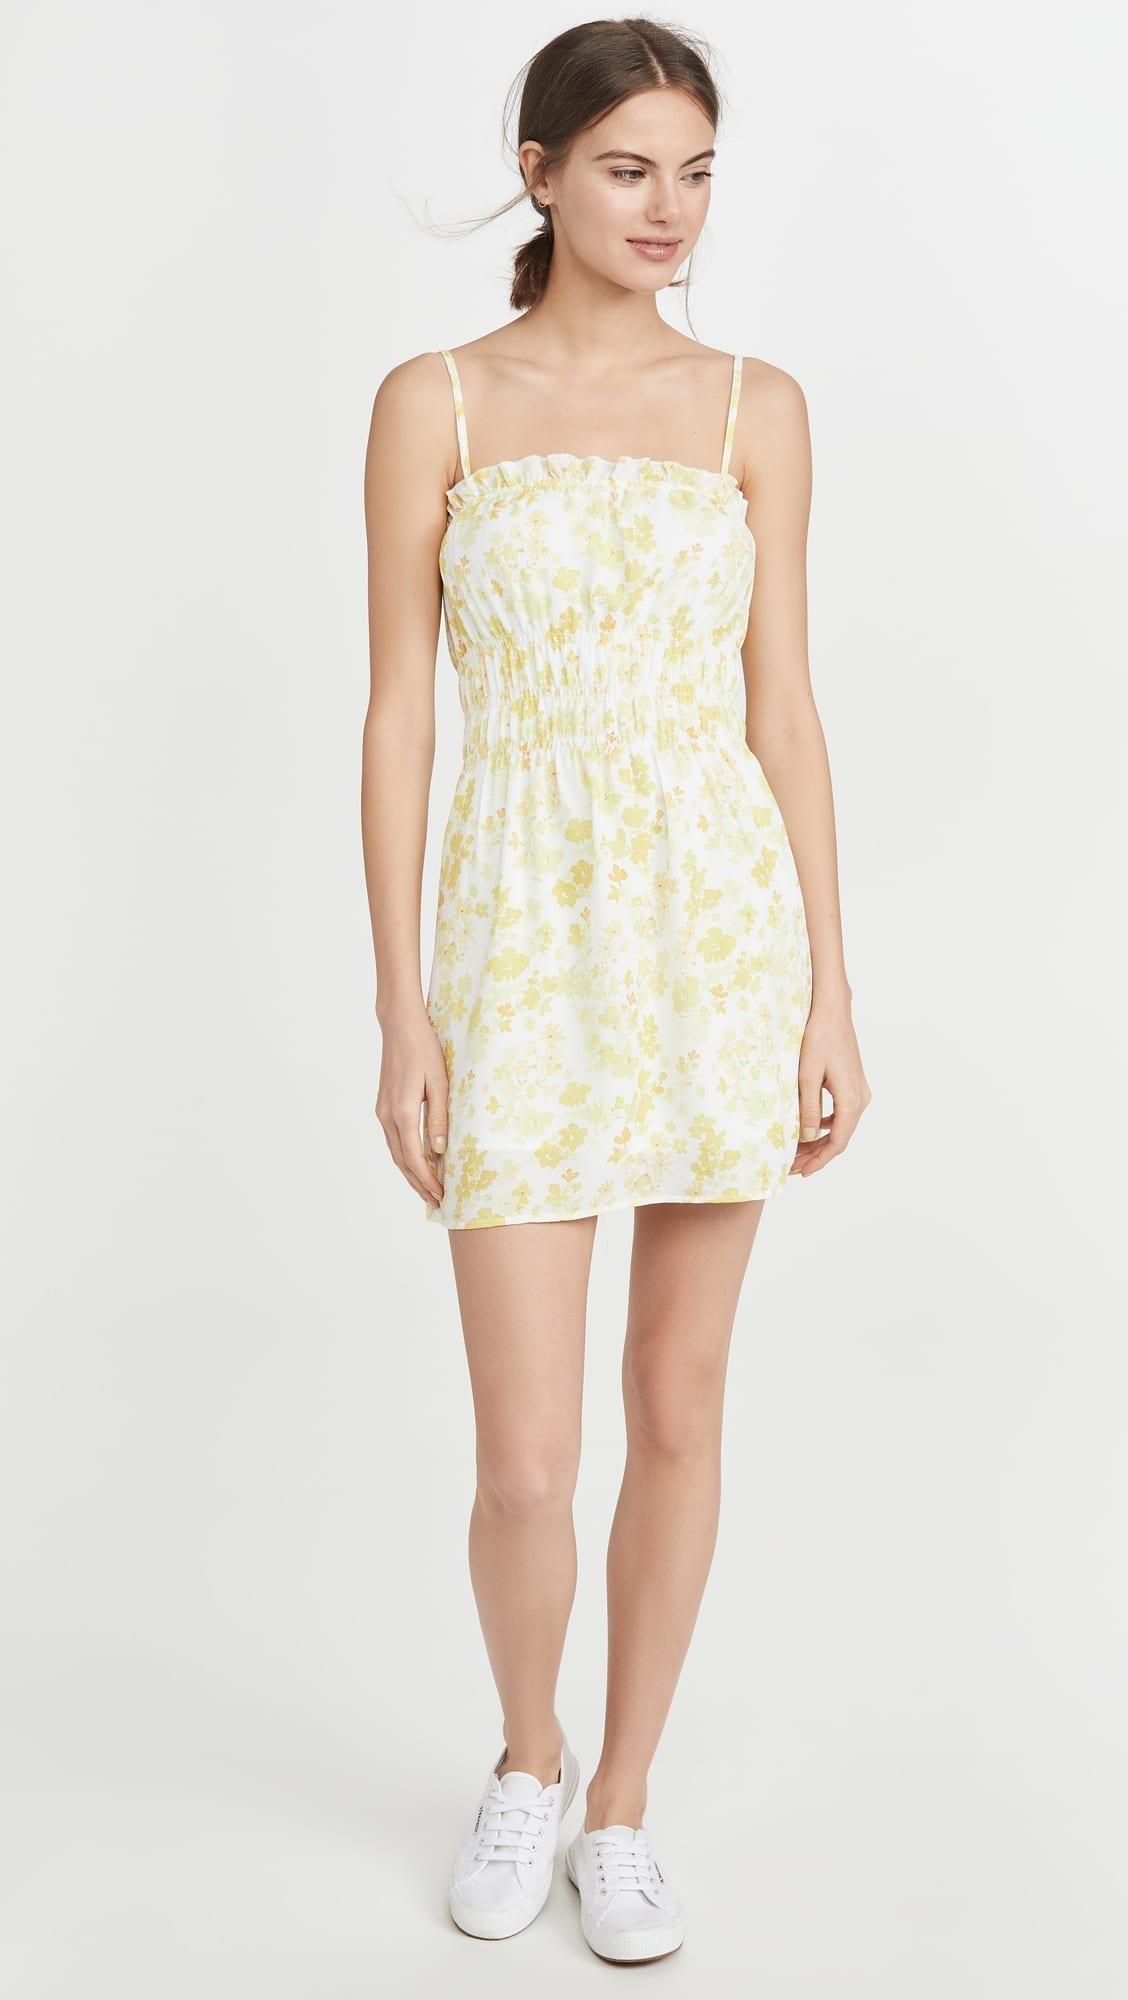 CHARLIE HOLIDAY Stella Mini Dress